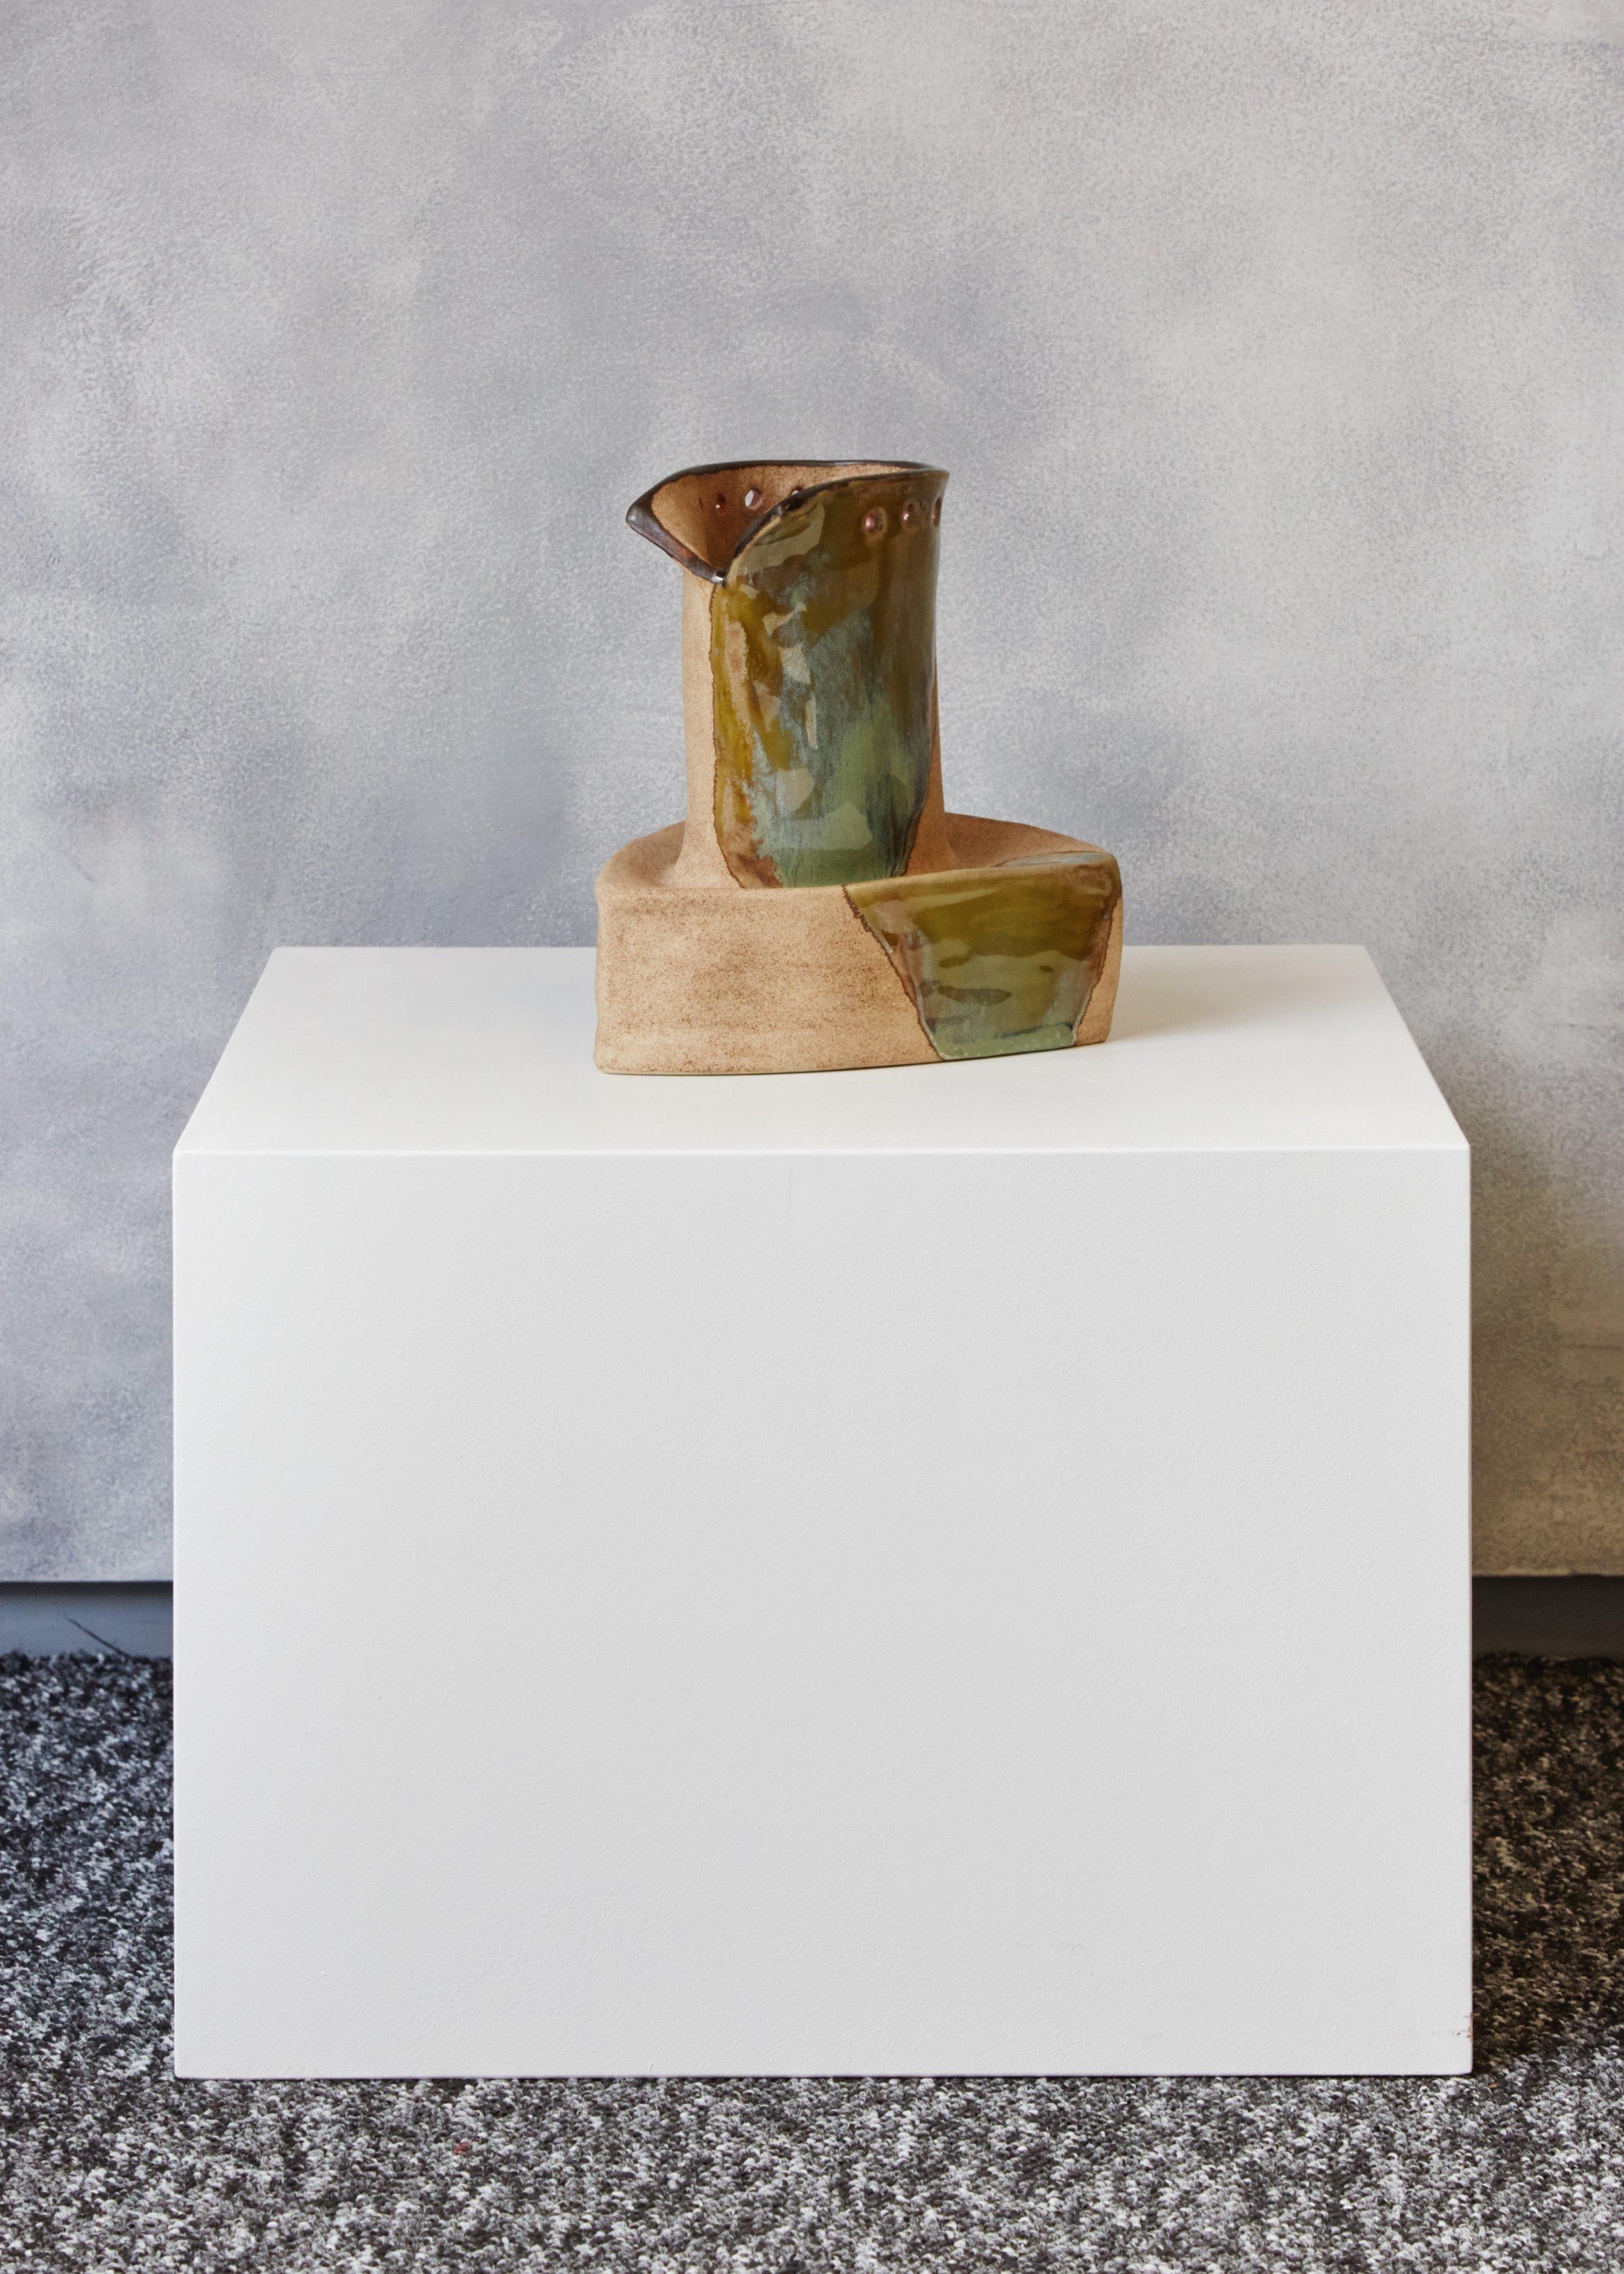 Steven, 2018 glazed stoneware ceramic 14 x 17 x 14.5 cm